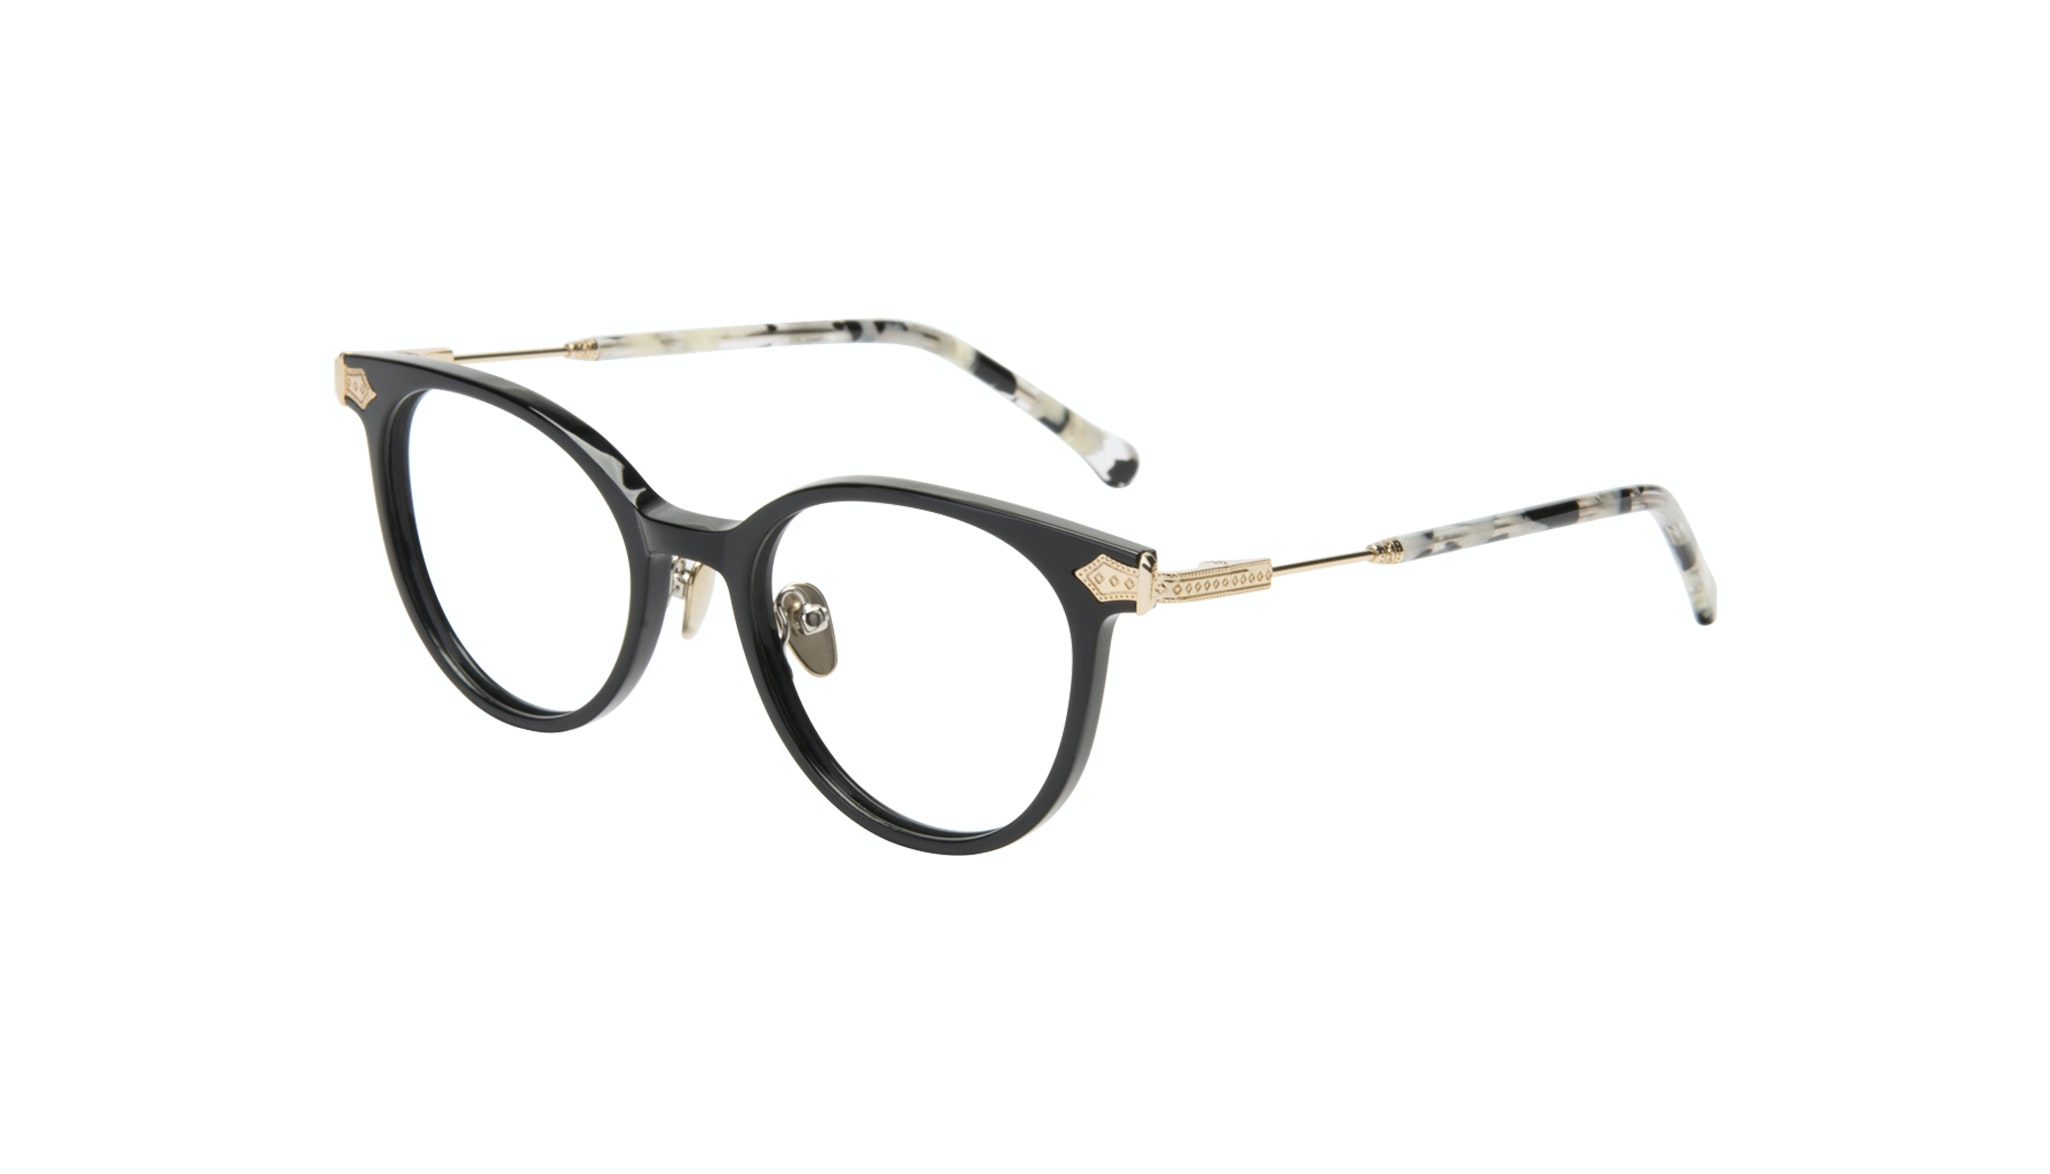 Affordable Fashion Glasses Round Eyeglasses Women Gem Onyx Marble Tilt